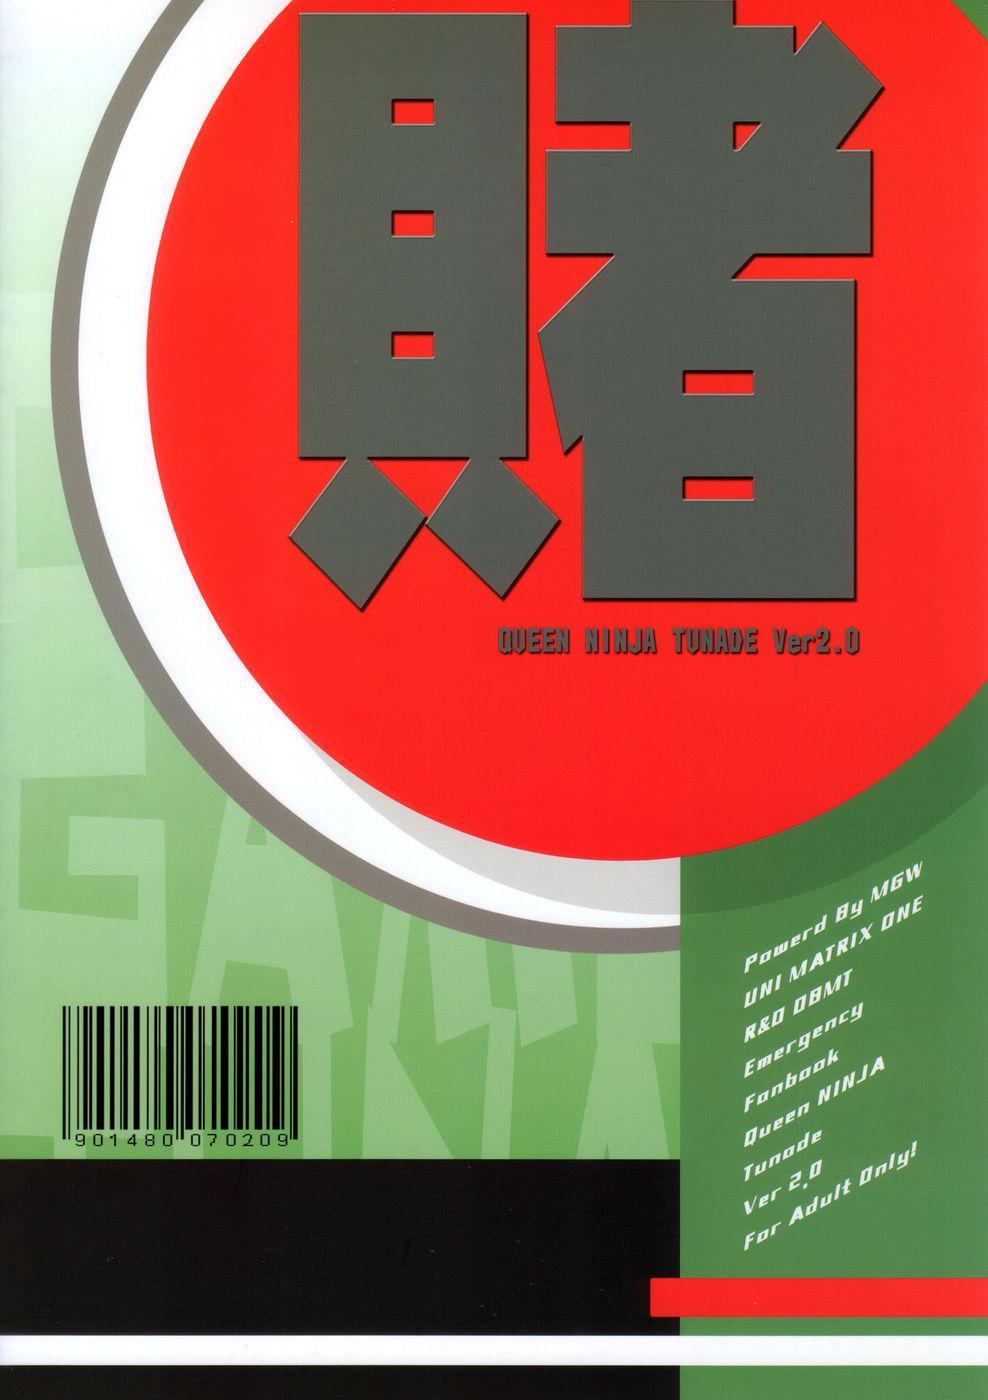 Q.N.T.2 - Queen Ninja Tsunade 2 33